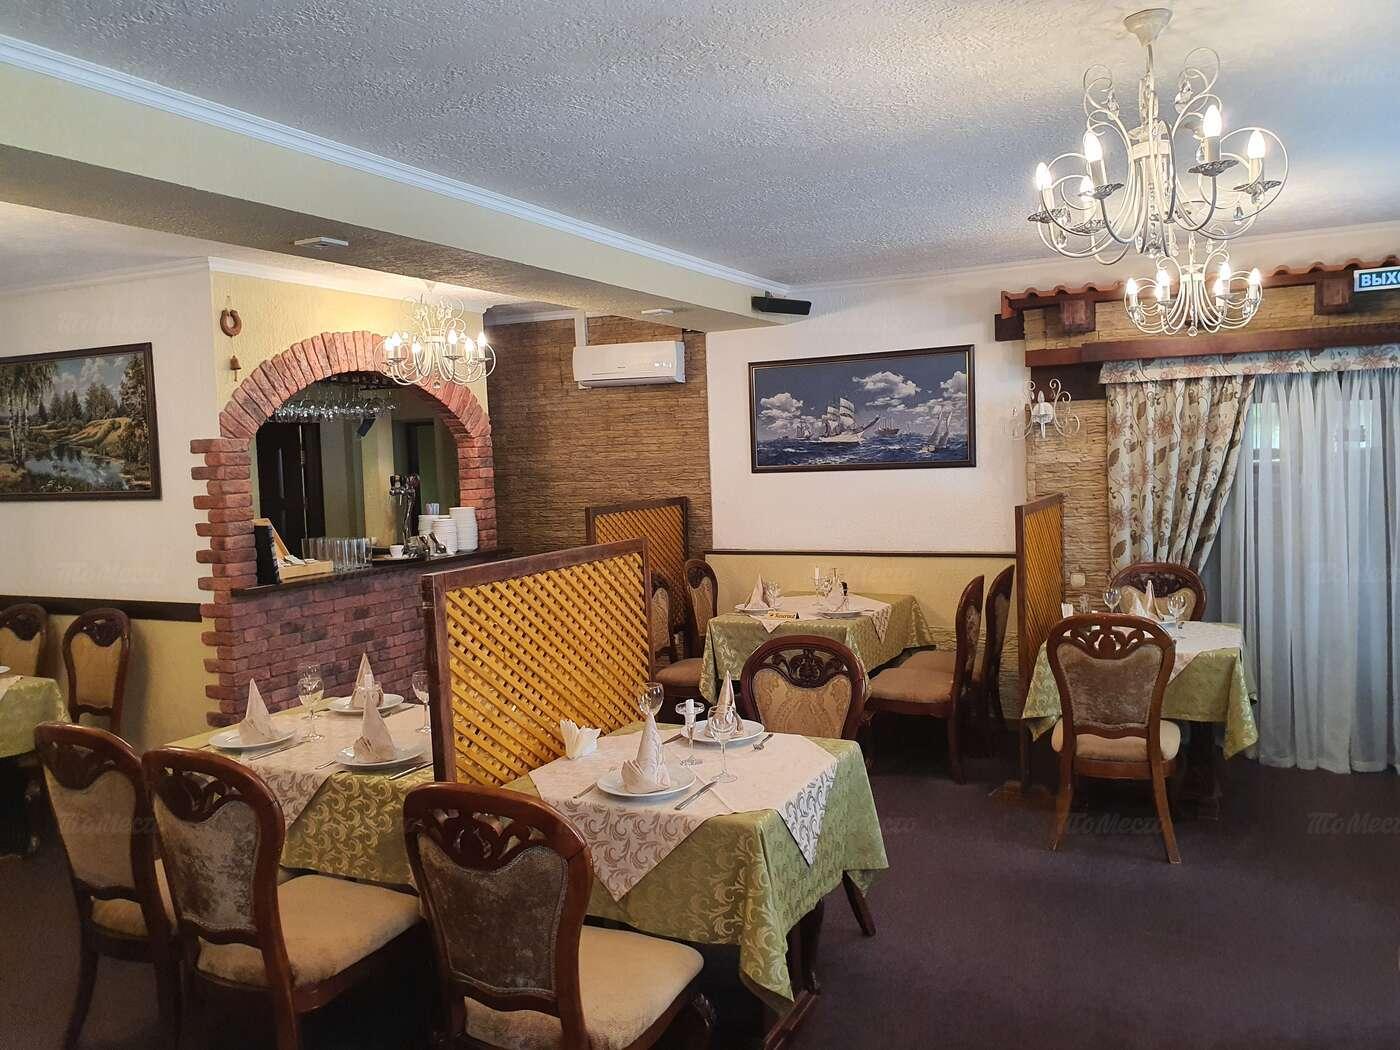 Ресторан Балканский Гурман на Декабристов фото 3